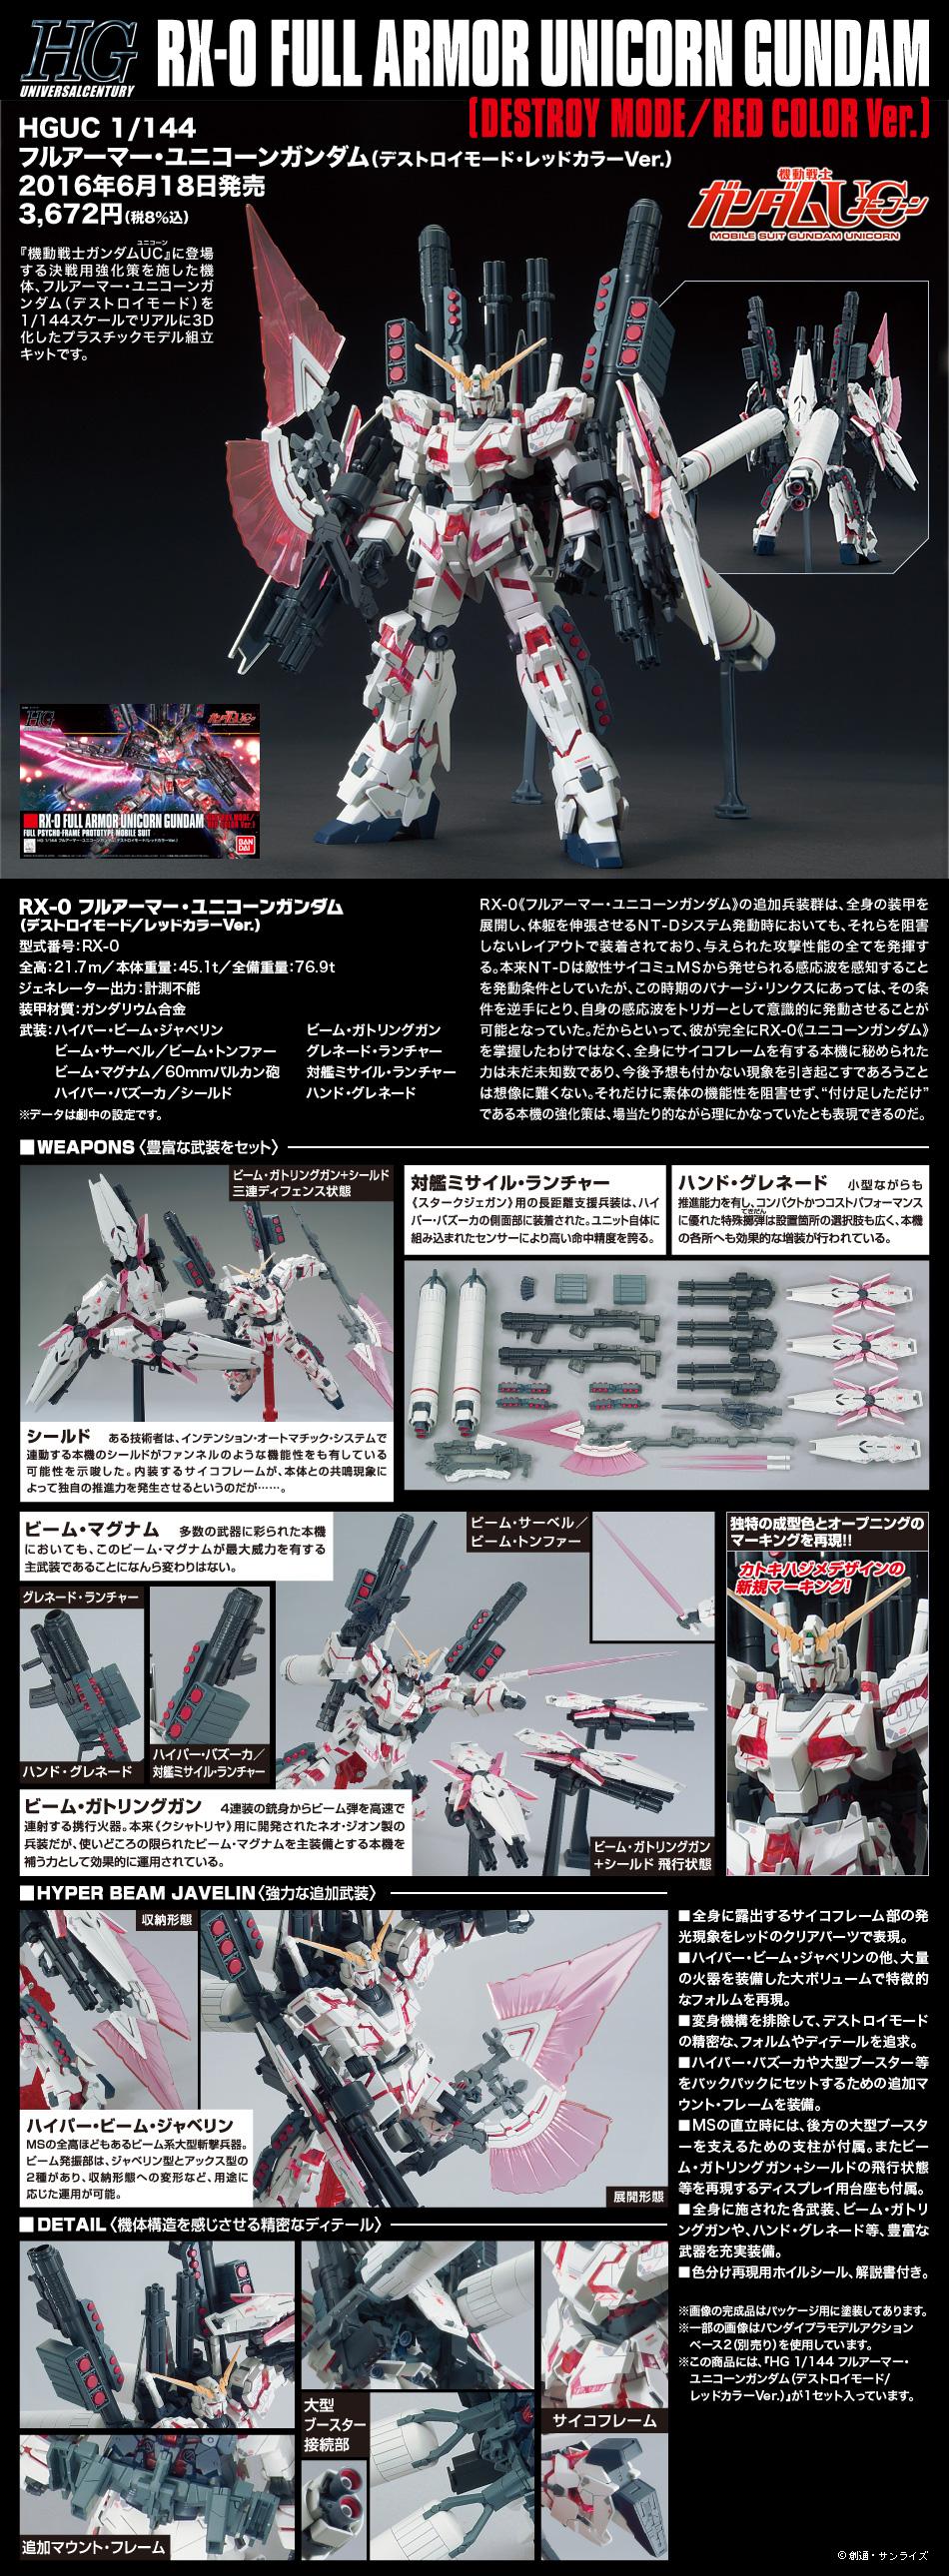 HGUC 1/144 RX-0 Full Armor Unicorn Gundam Destroy Mode RED COLOR VER.